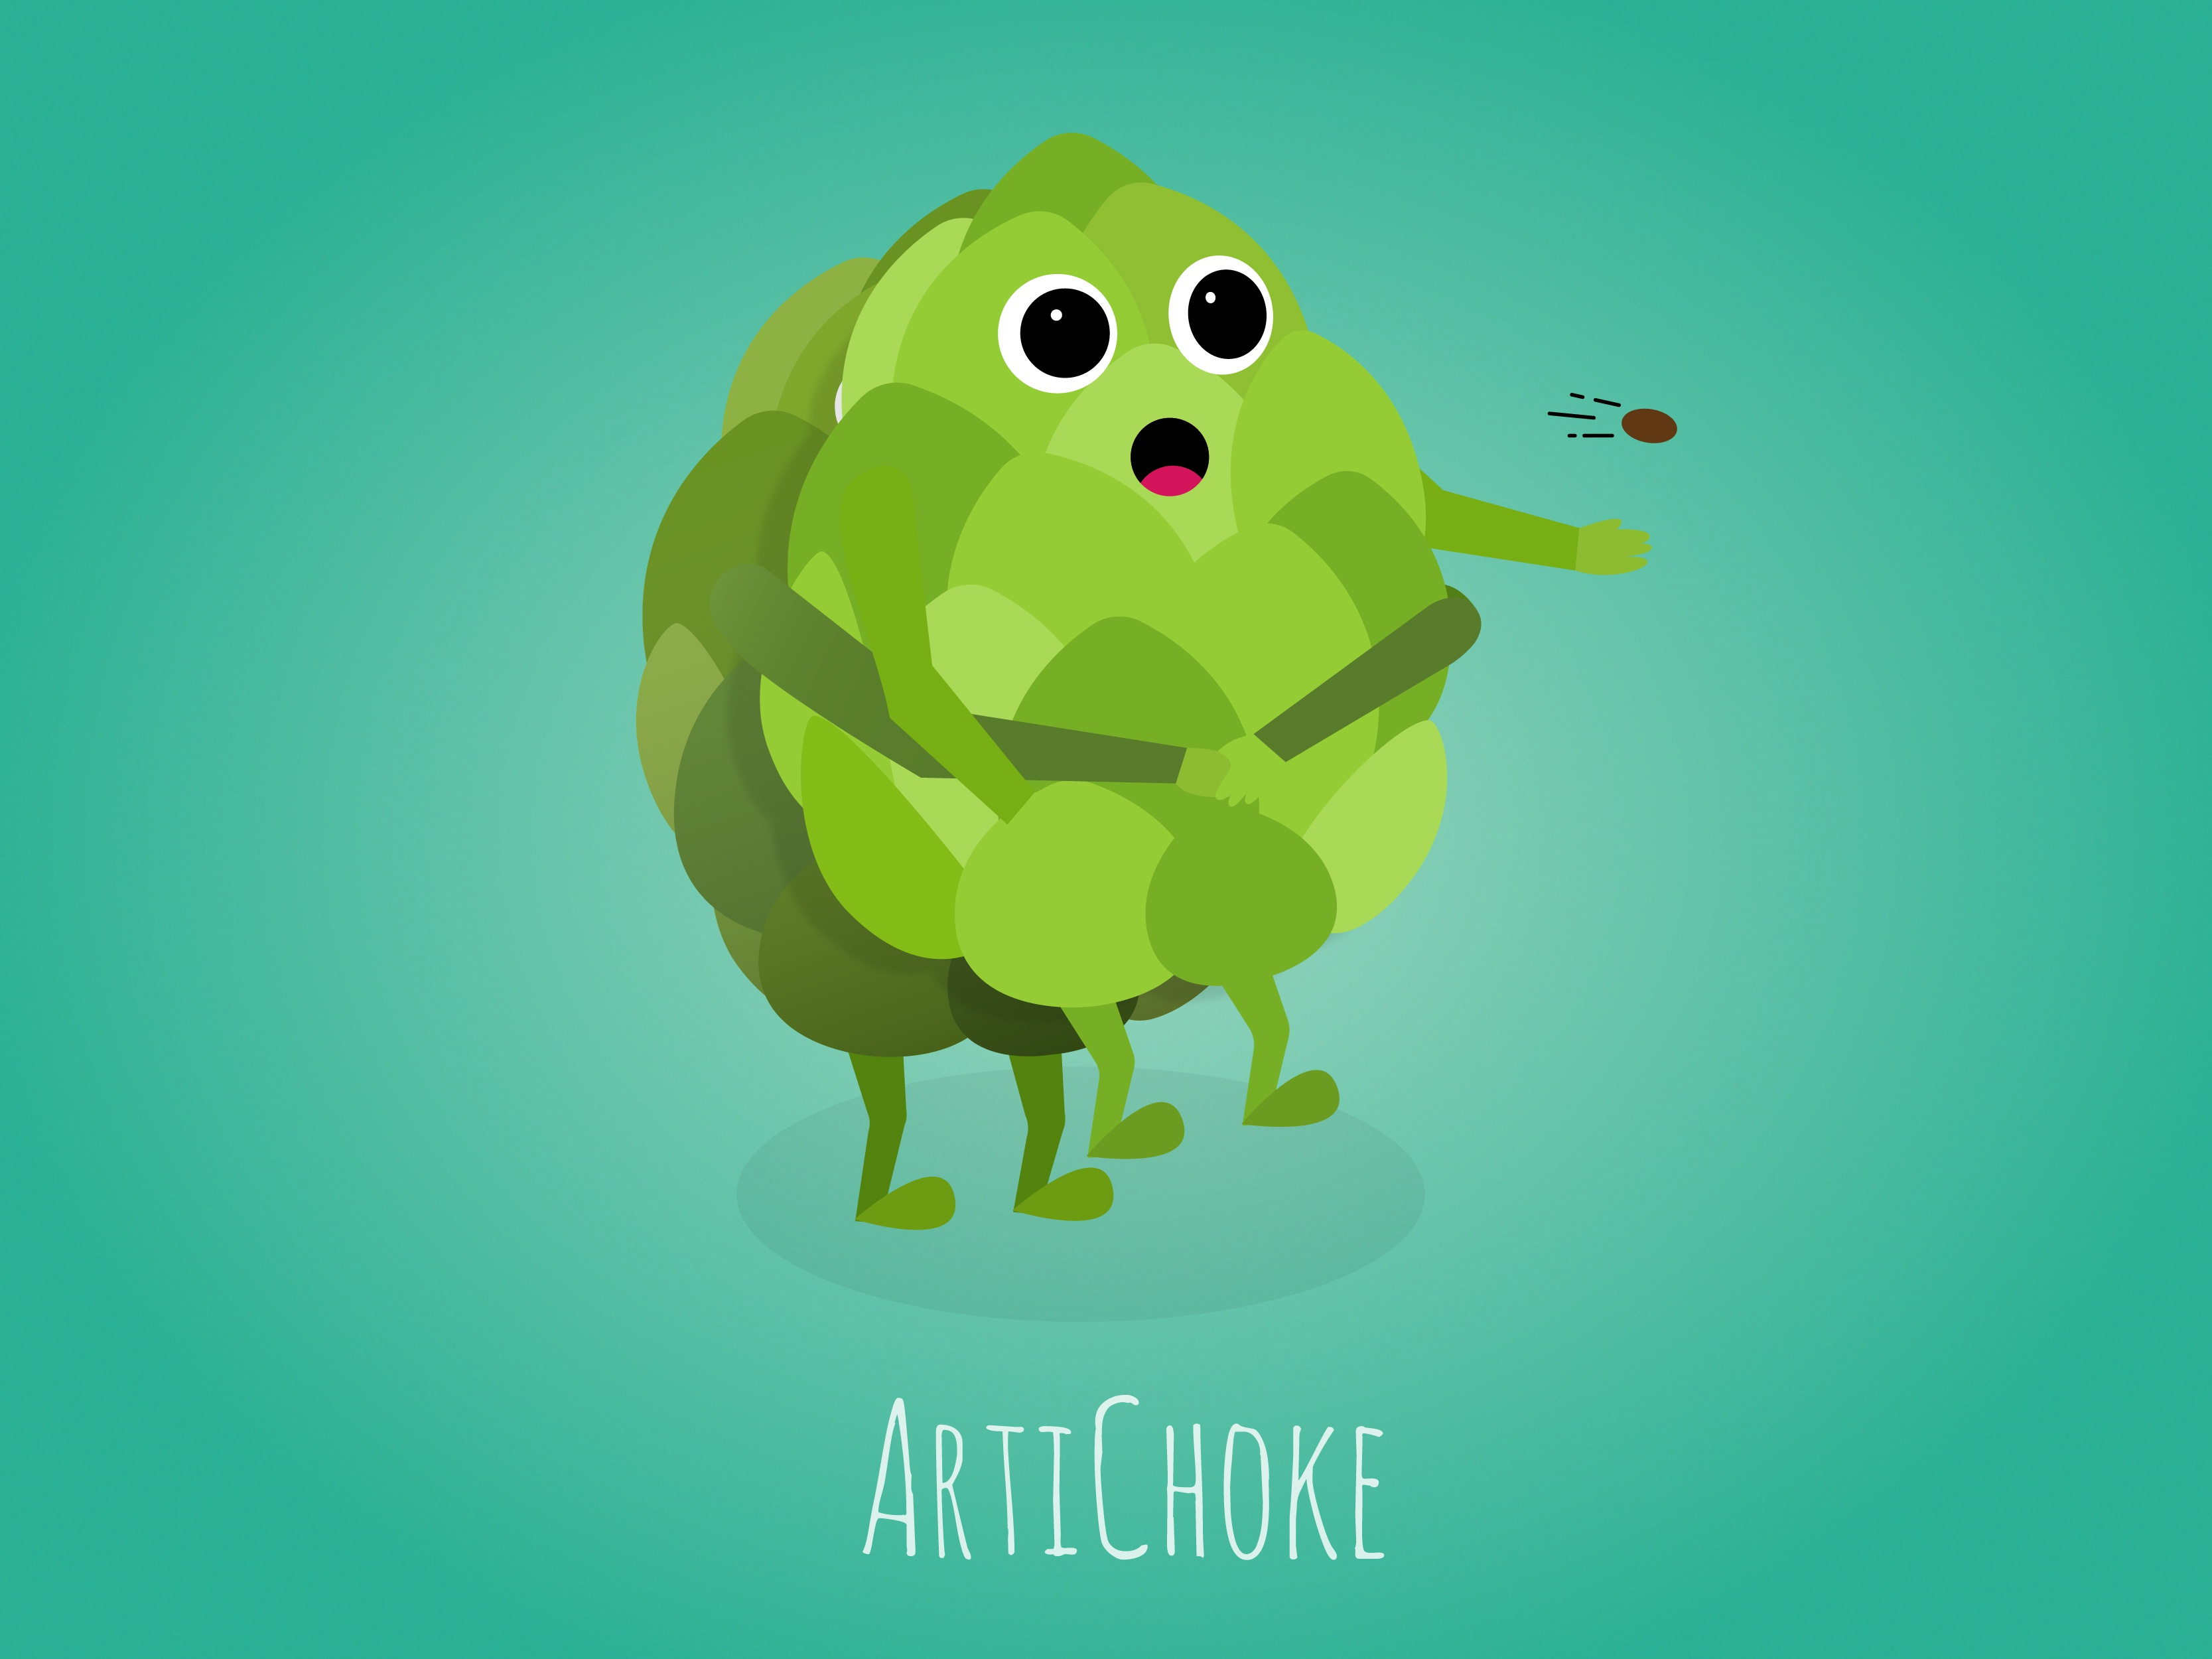 Artichoke illustration